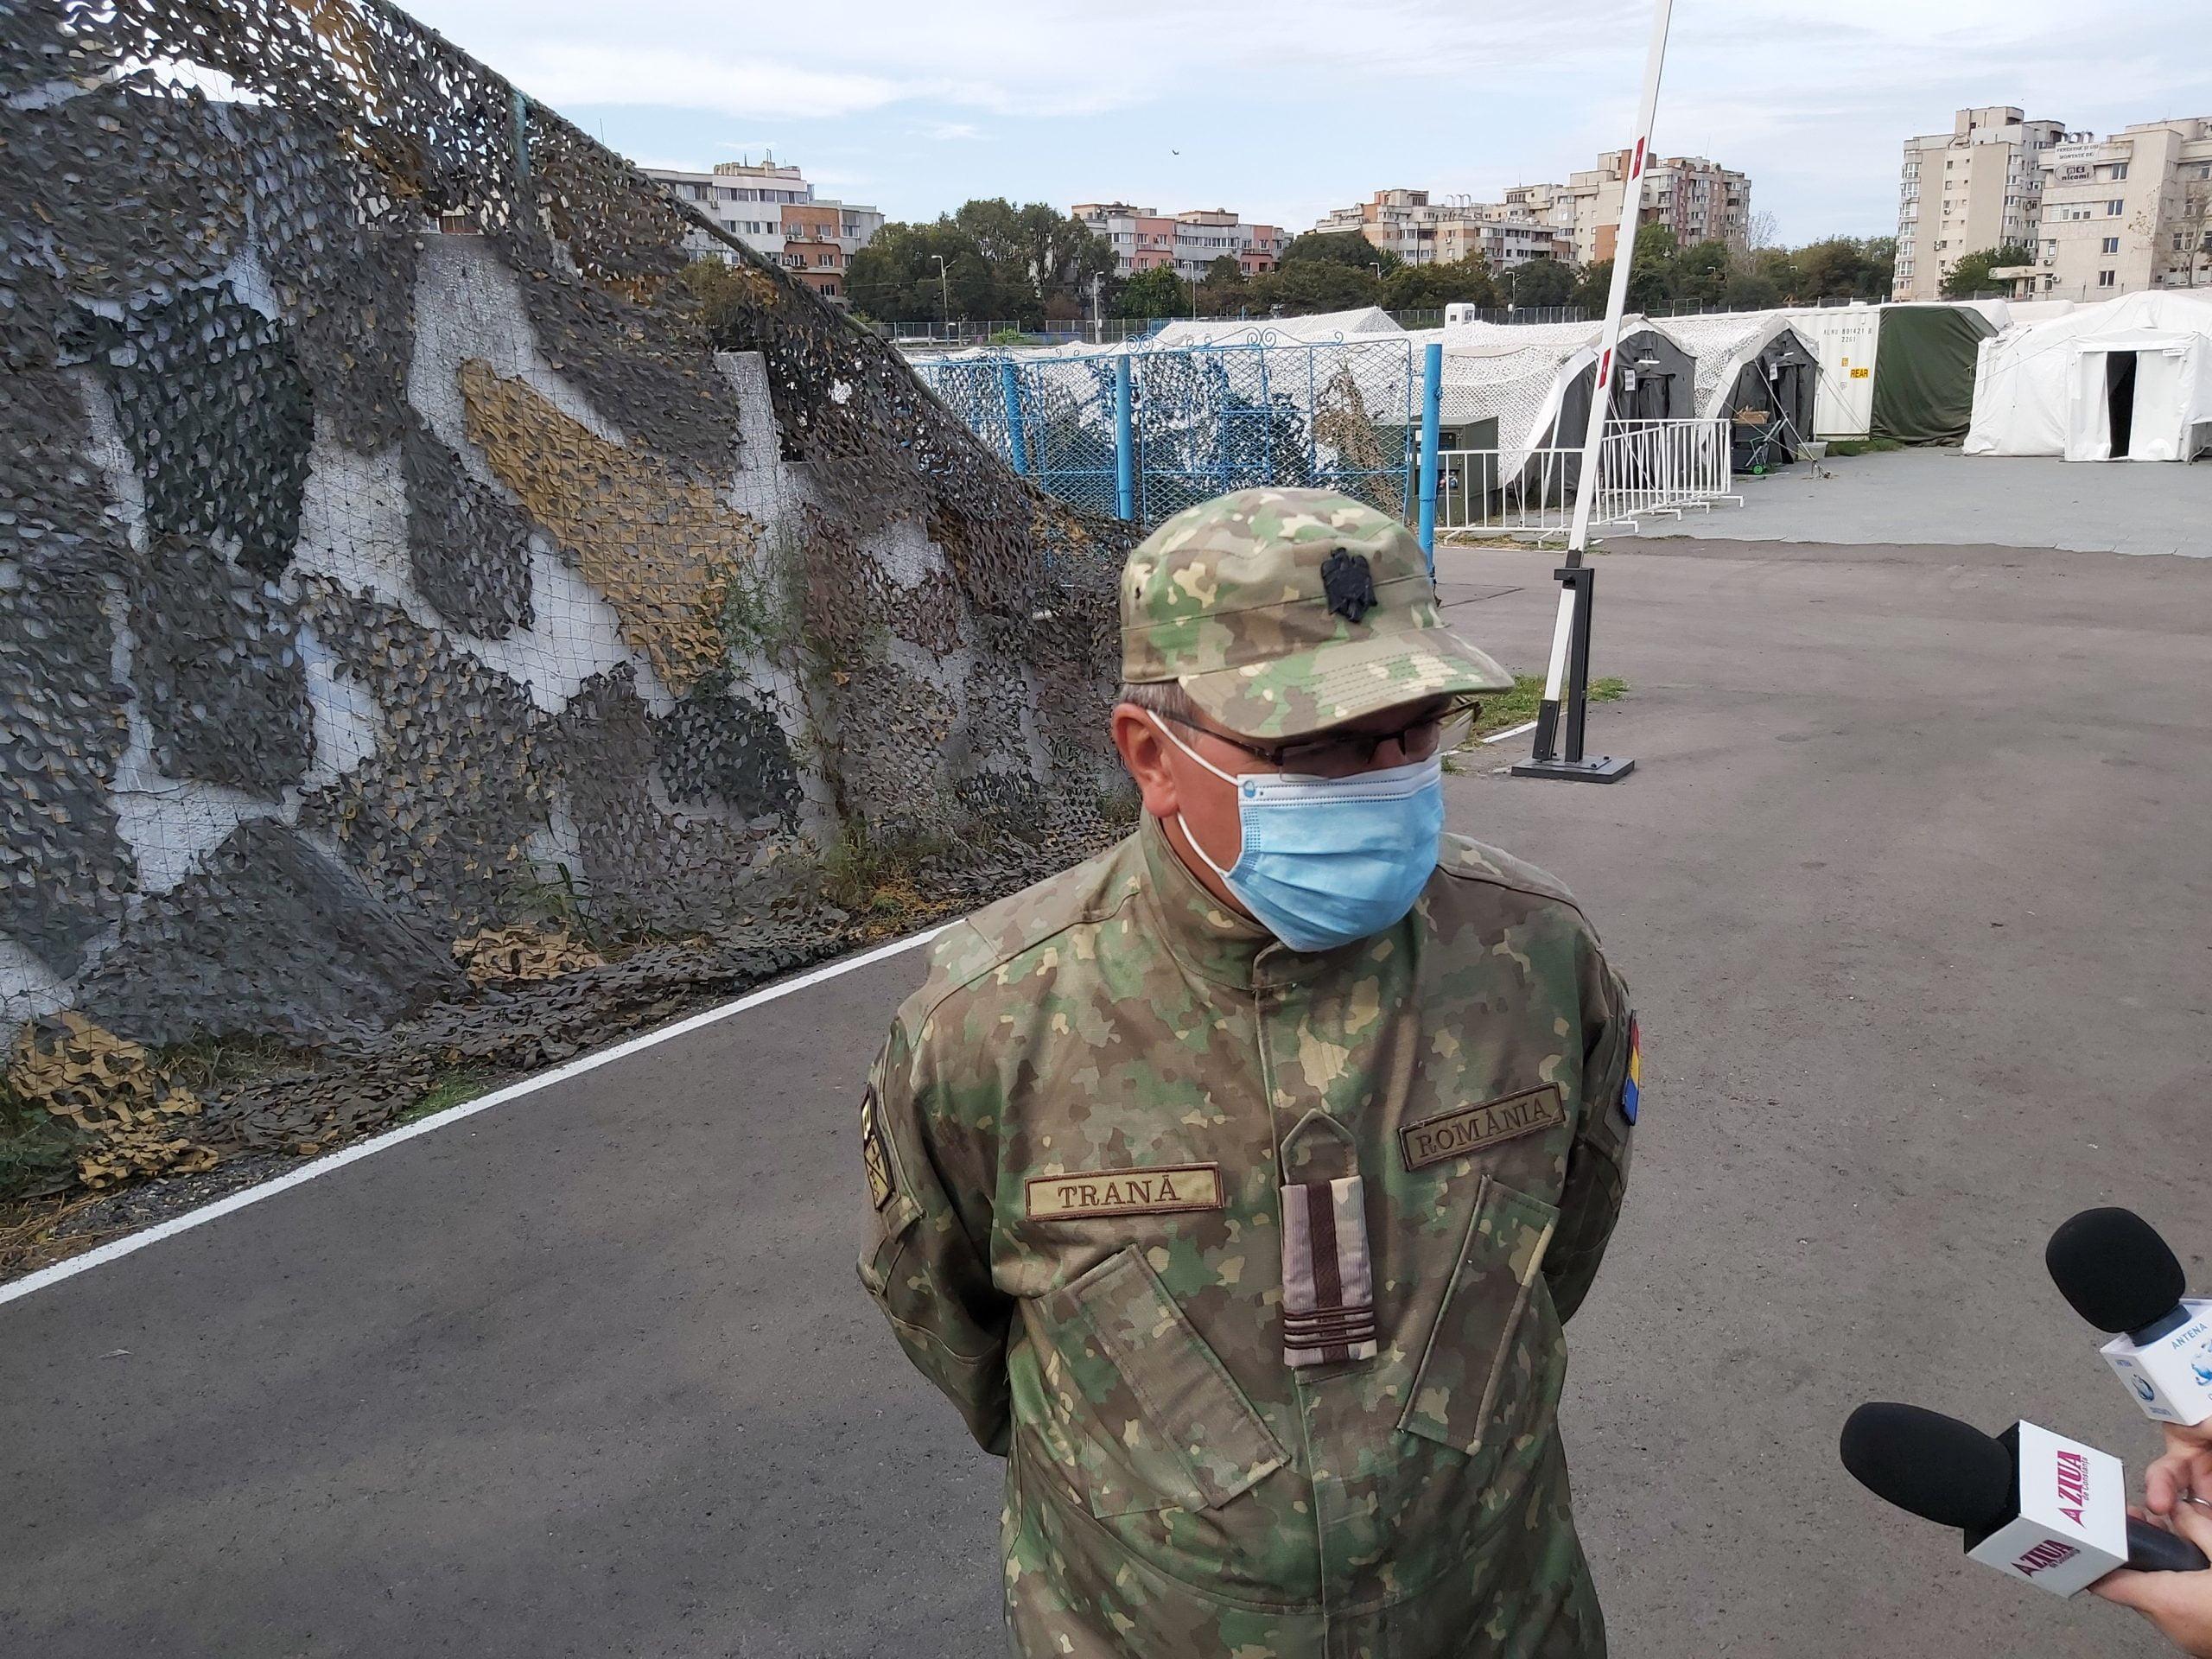 trana spital militar scaled